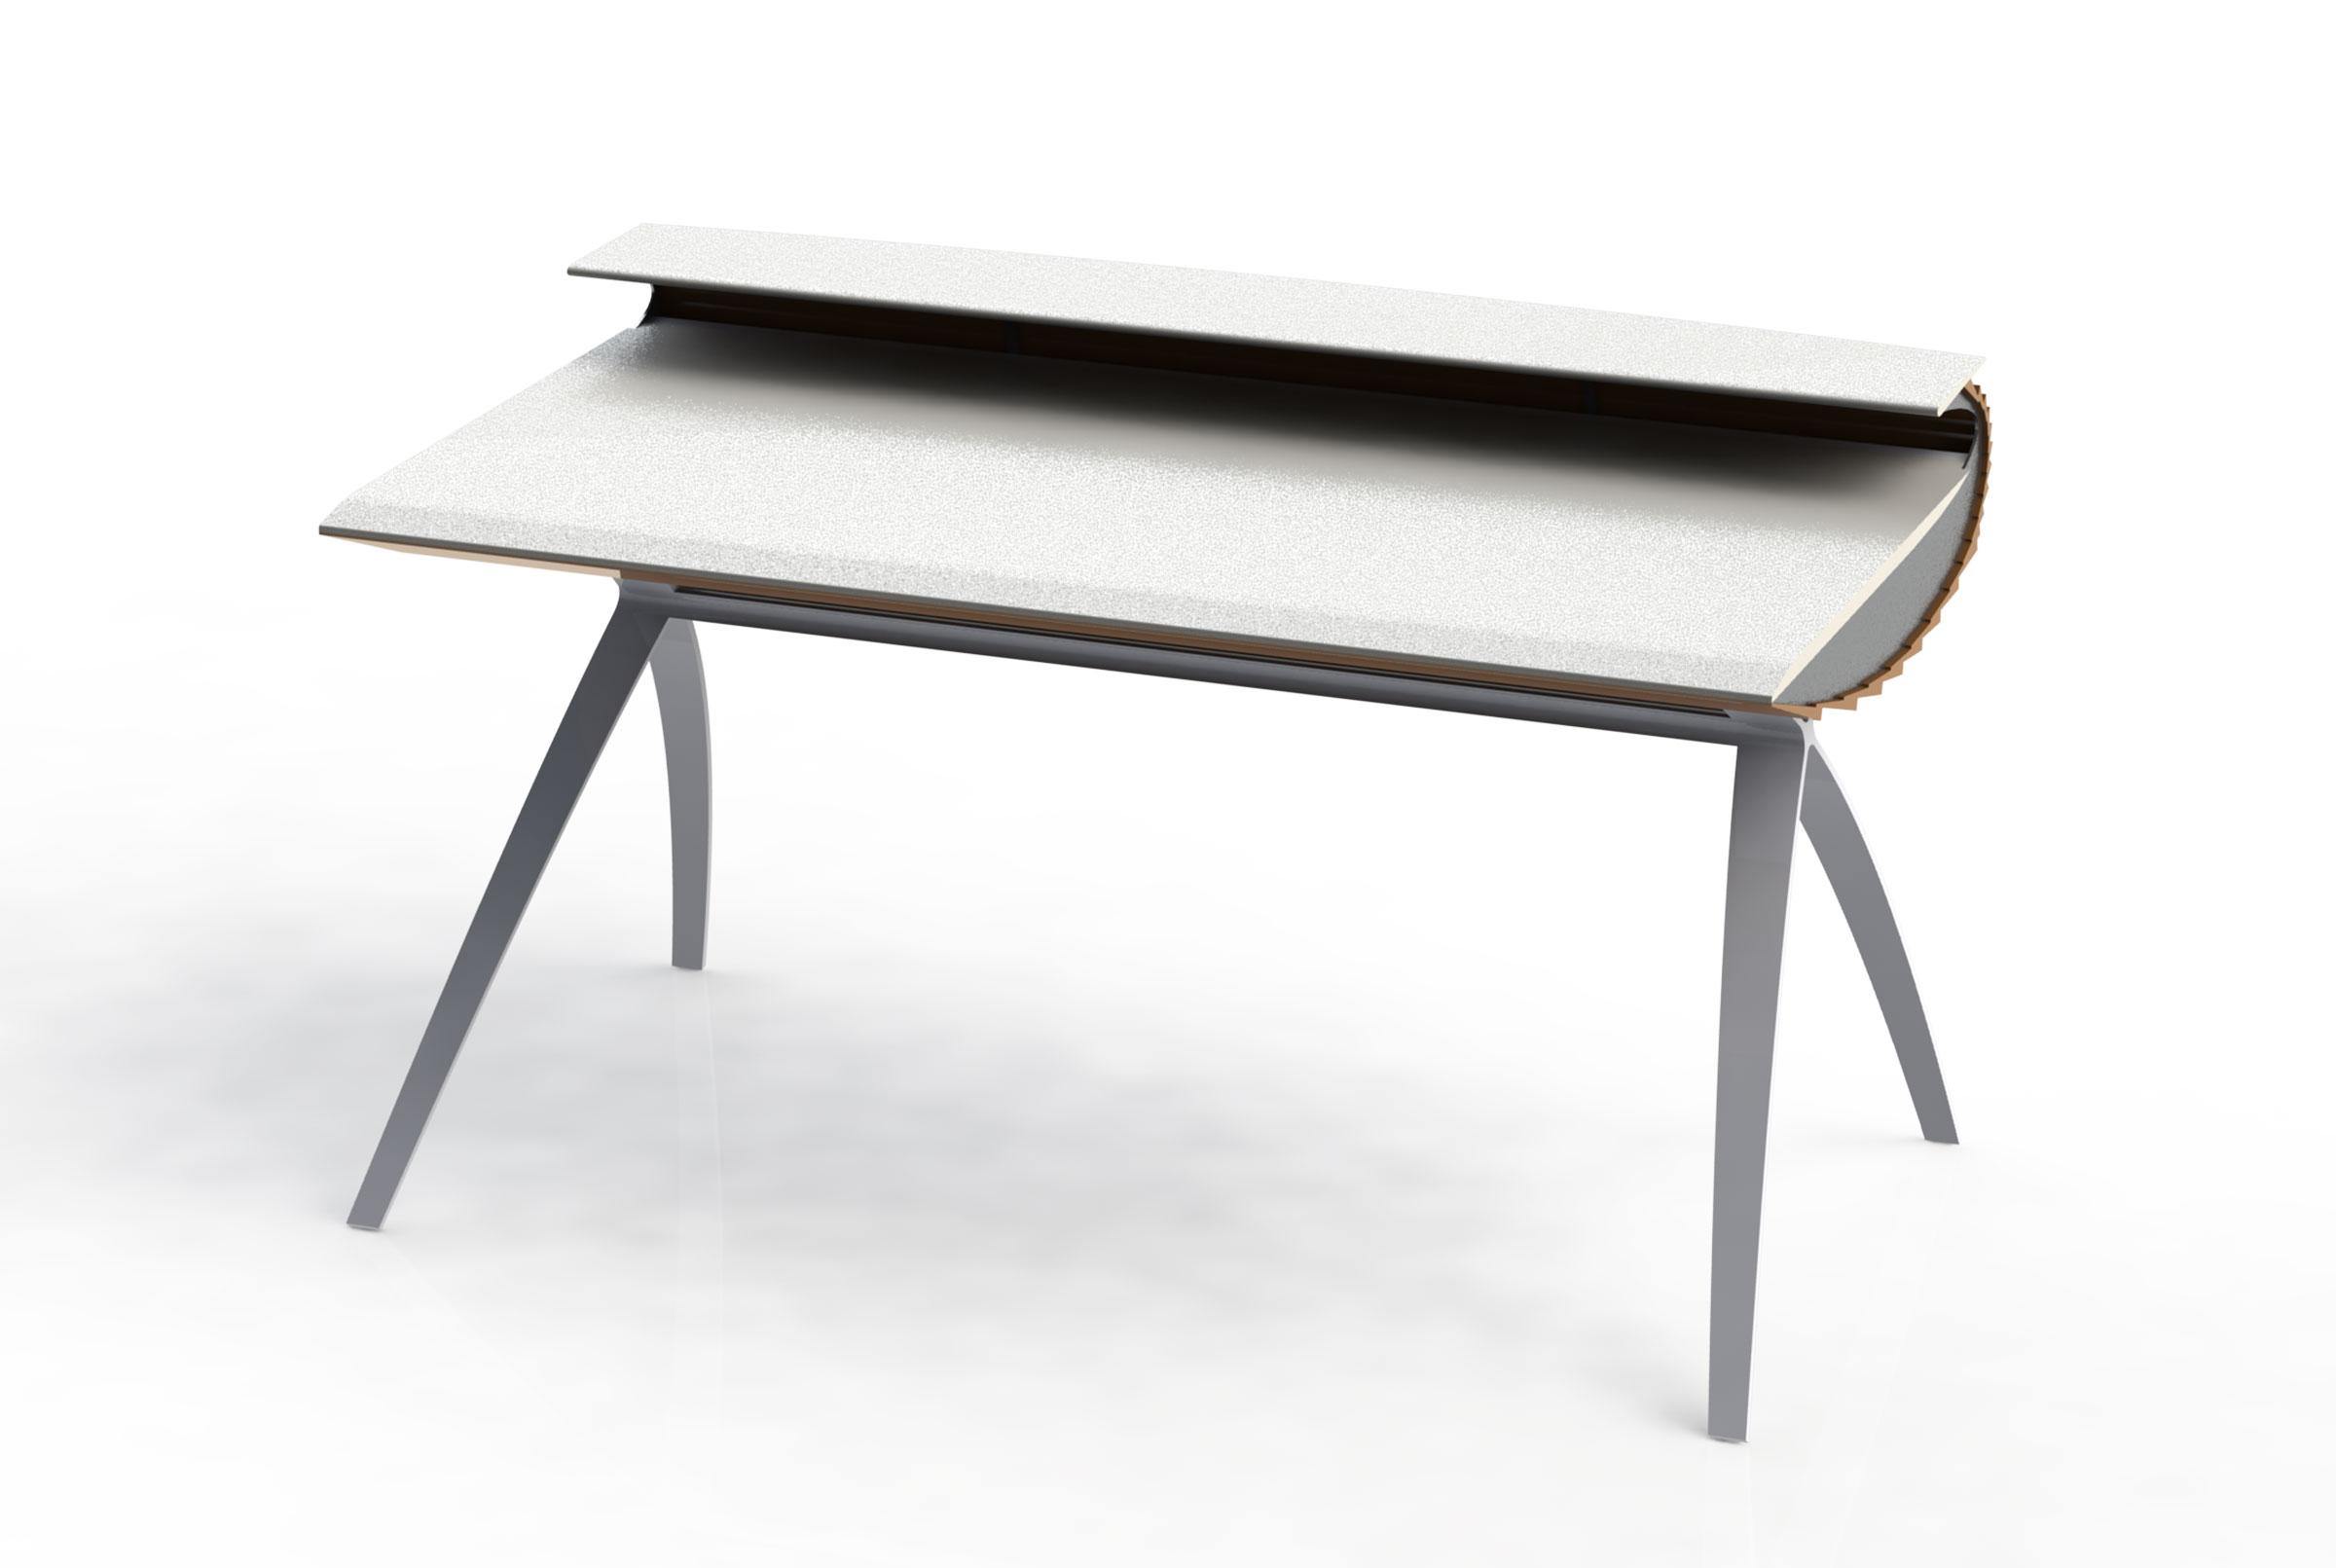 table7-3@2x.jpg